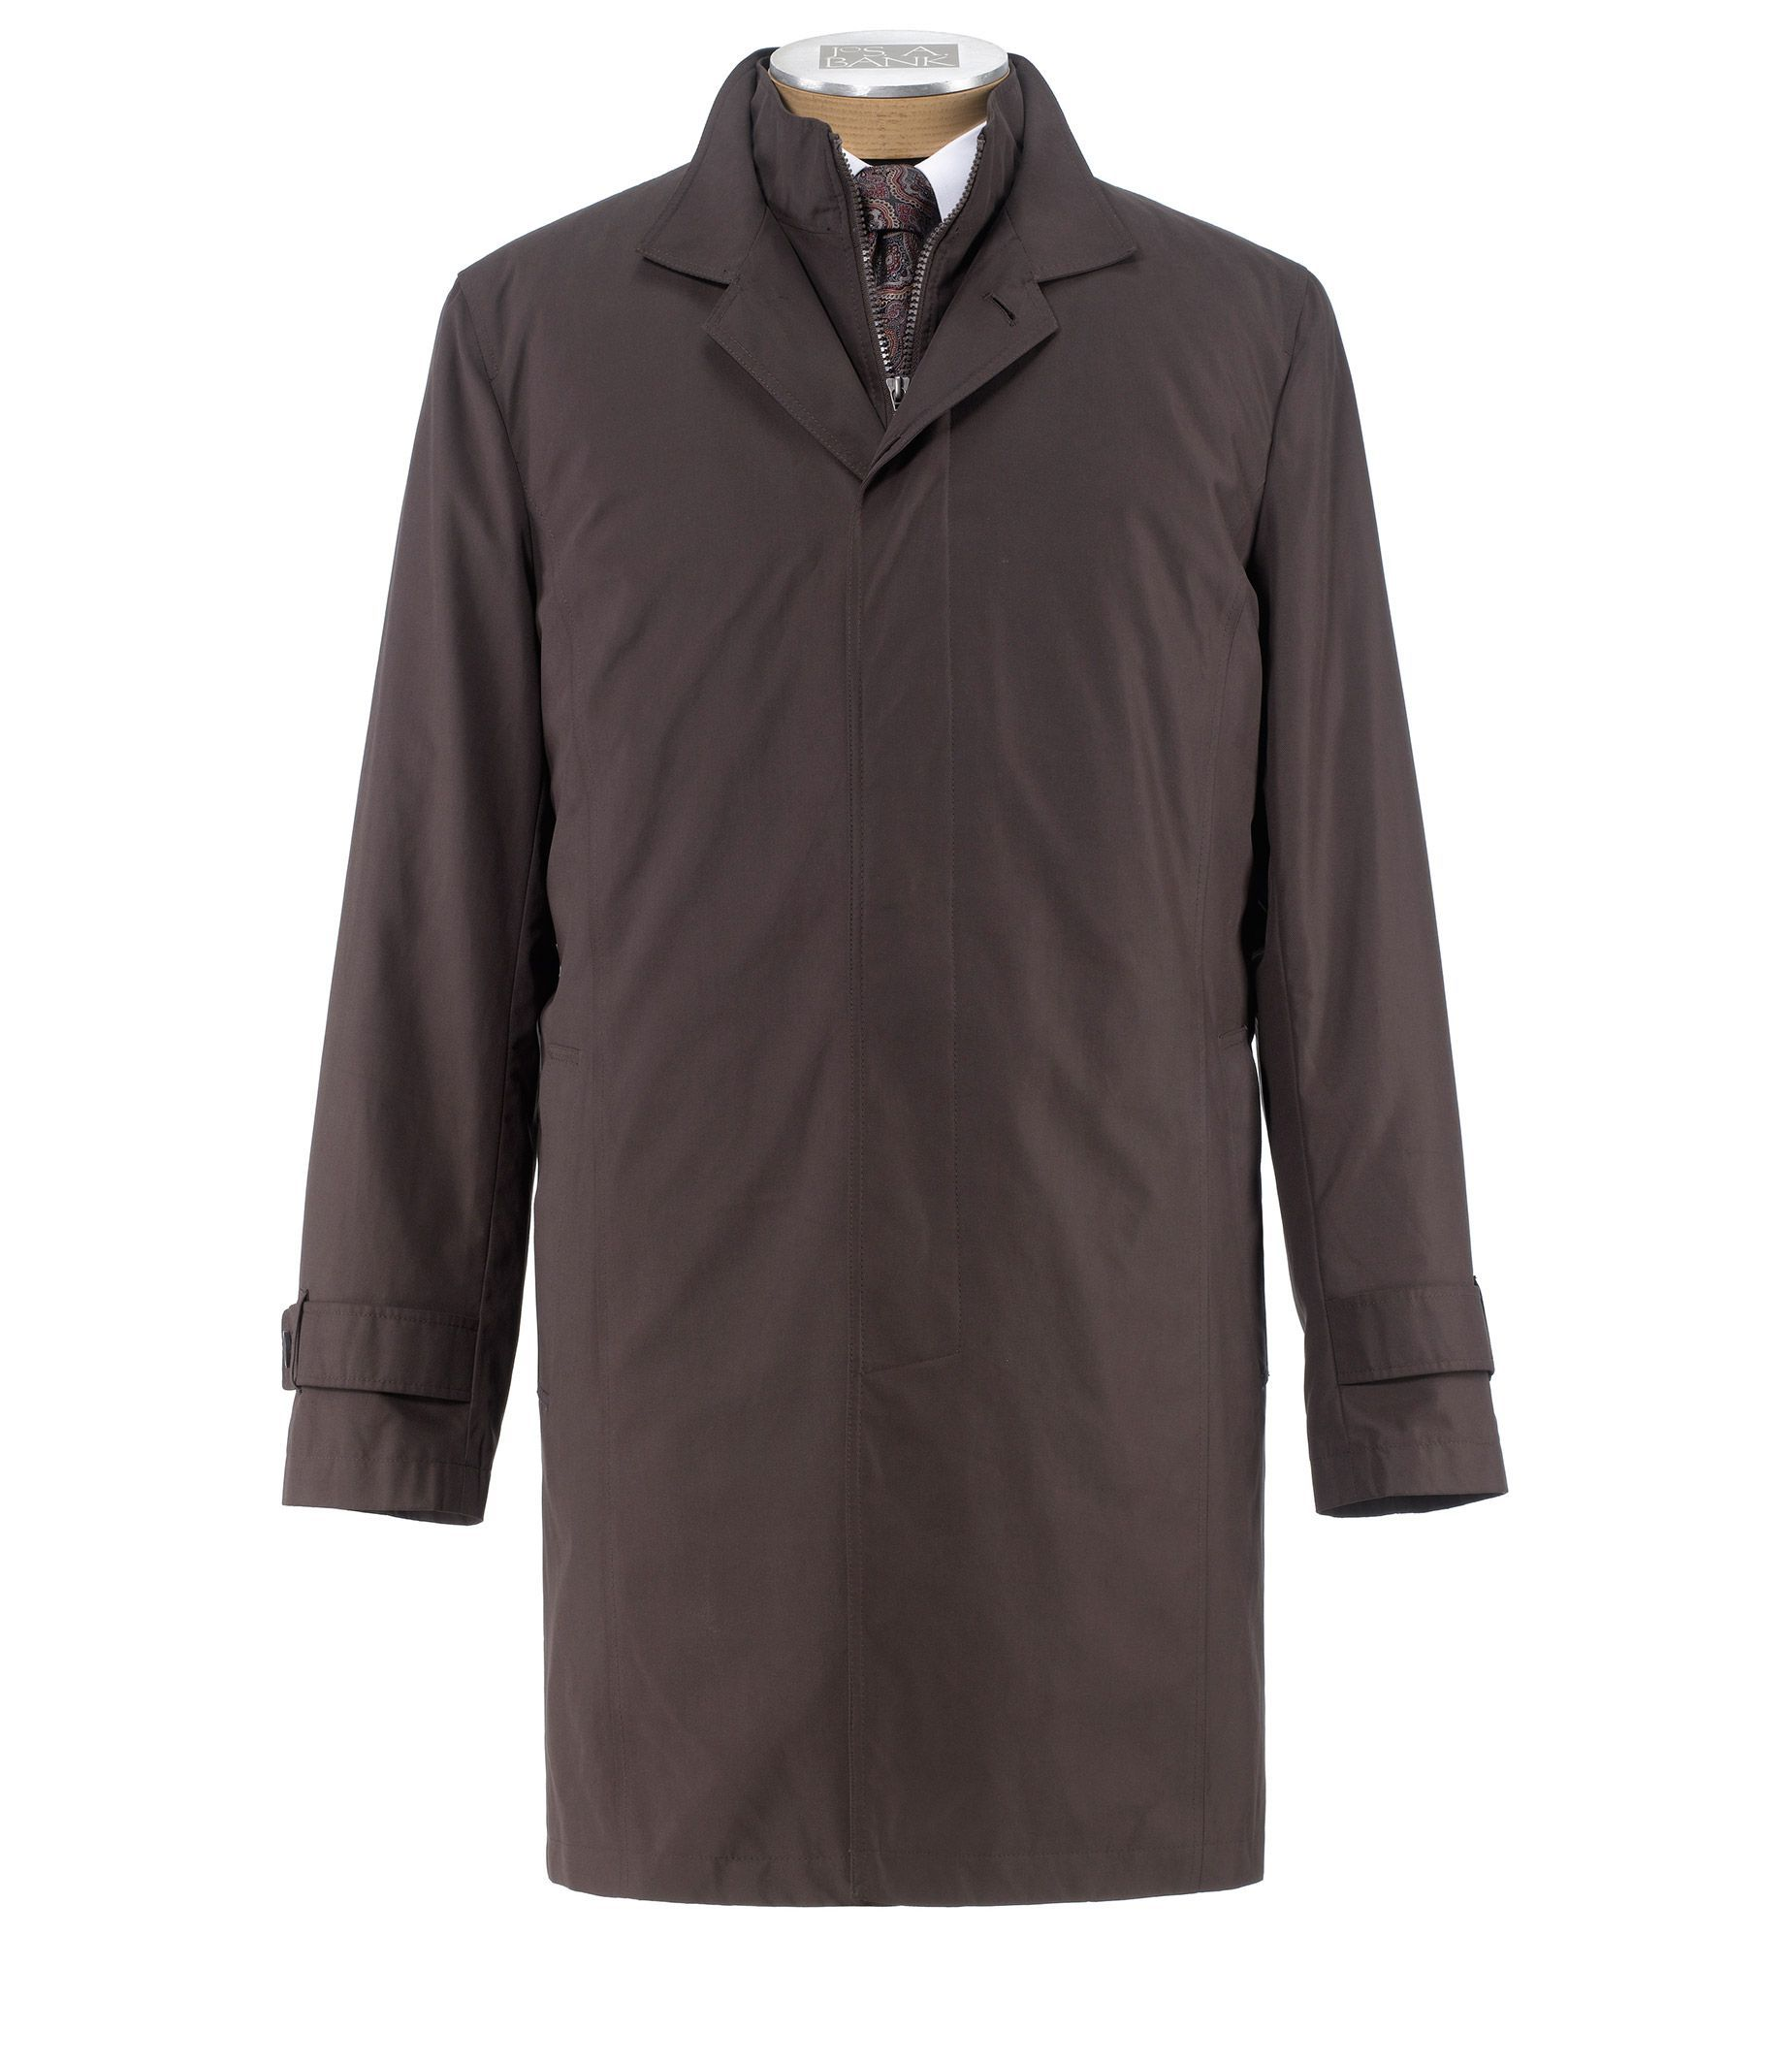 Joseph Three-Quarter Length Double Collar Raincoat